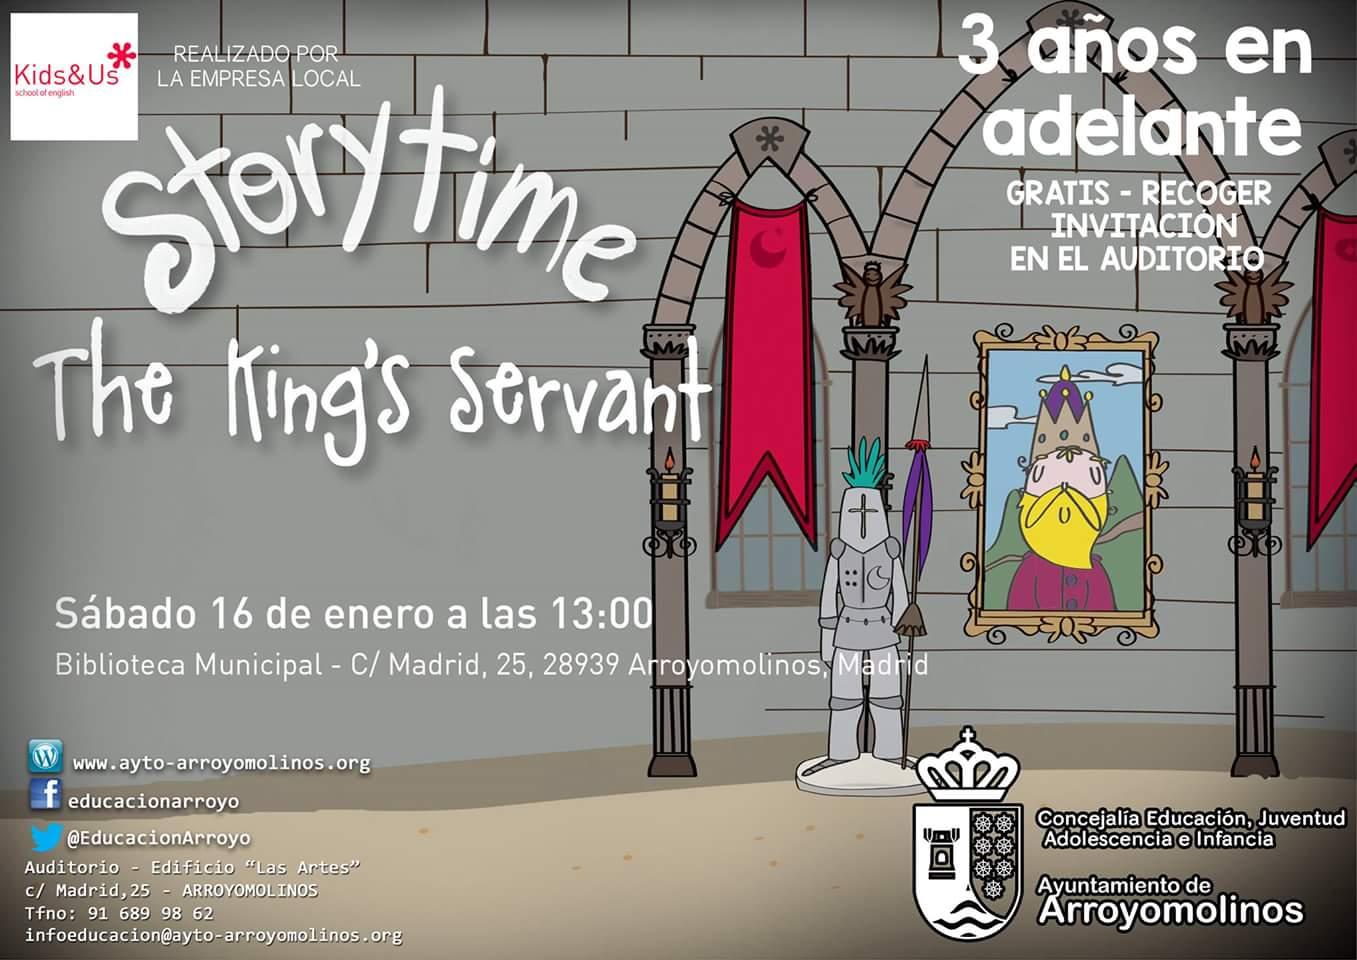 Storytime the king servant